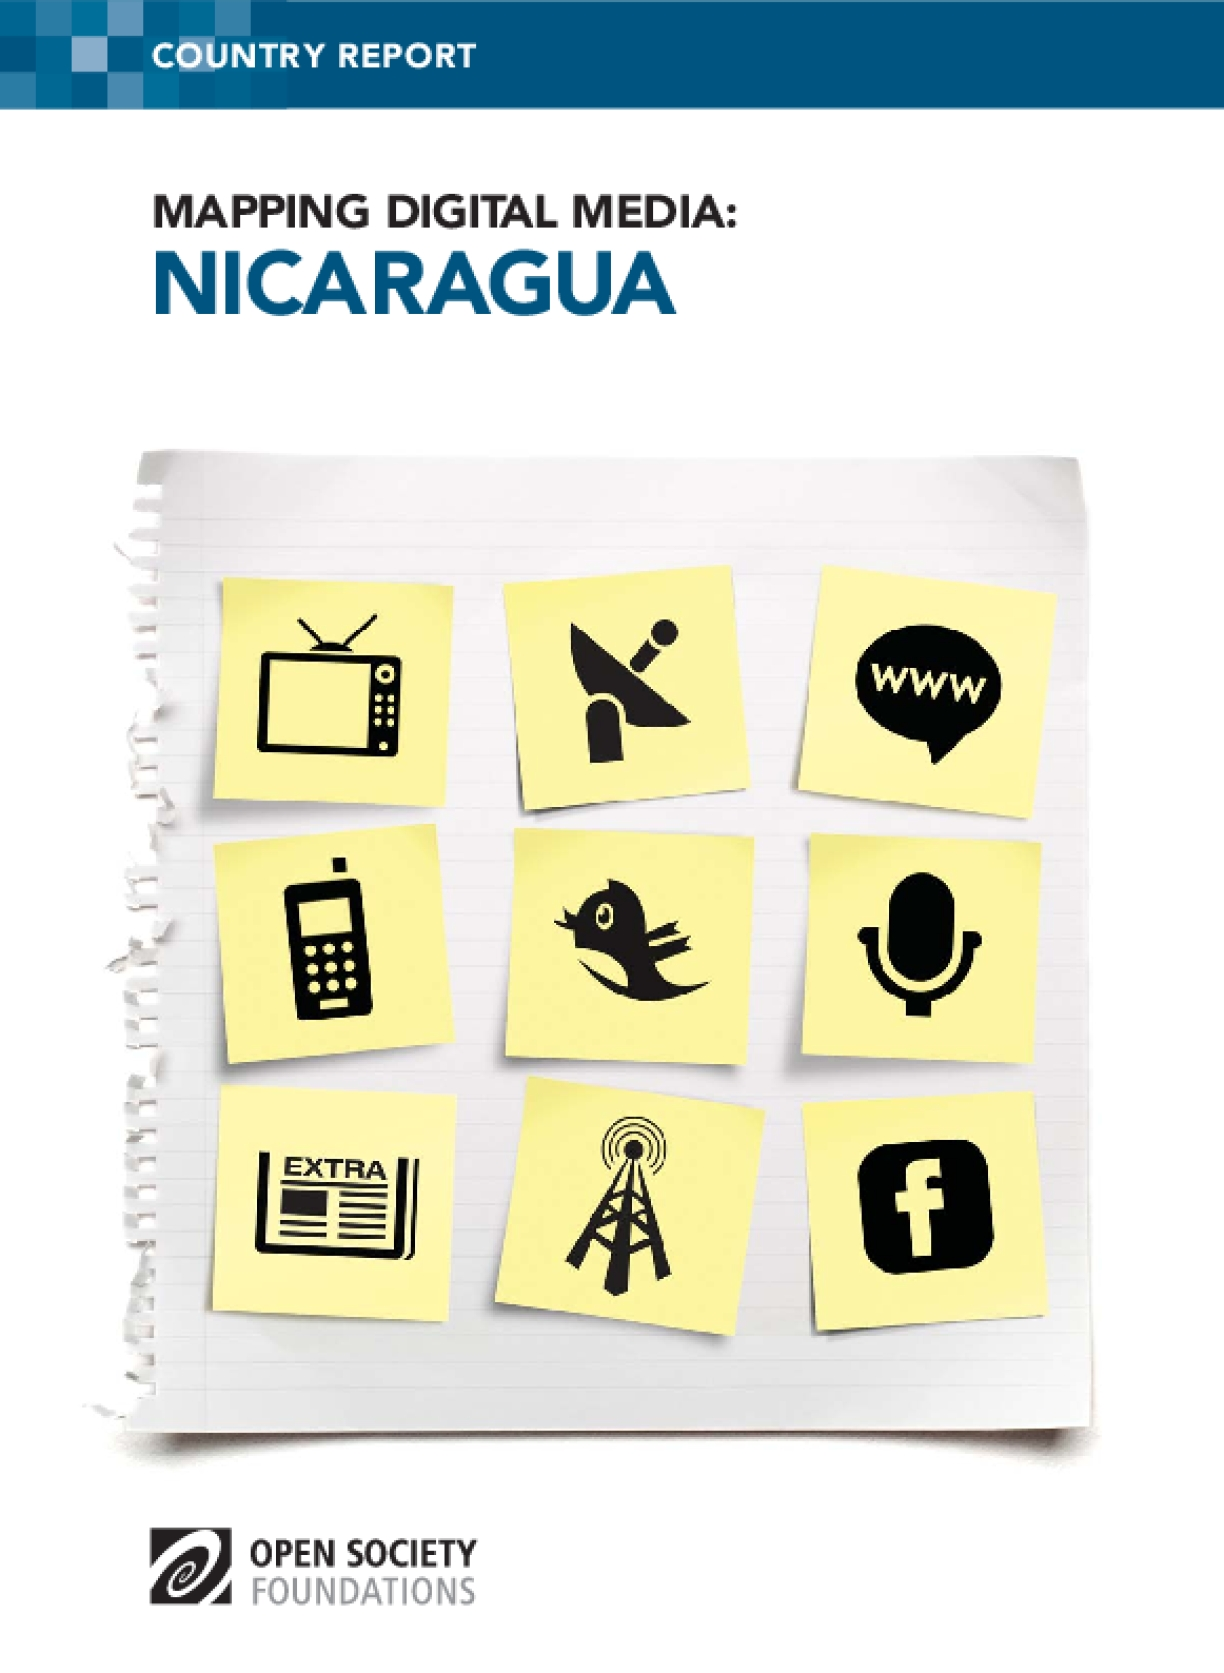 Mapping Digital Media: Nicaragua